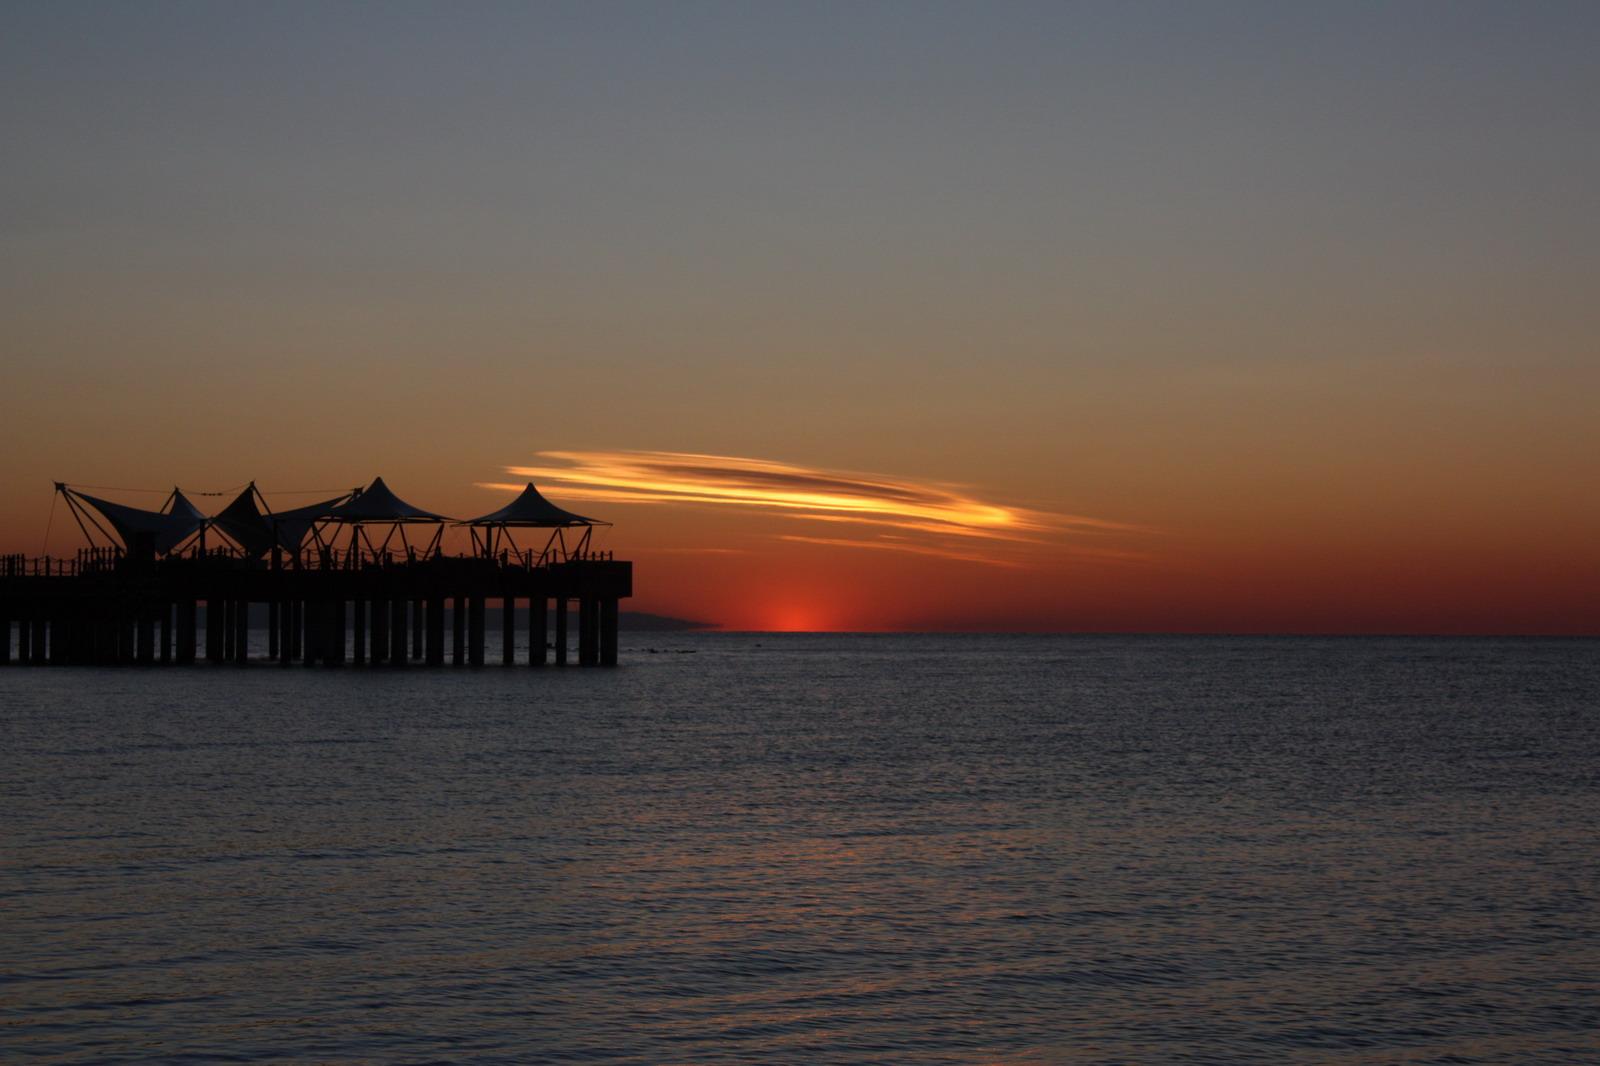 Sonnenaufgang in Antalya